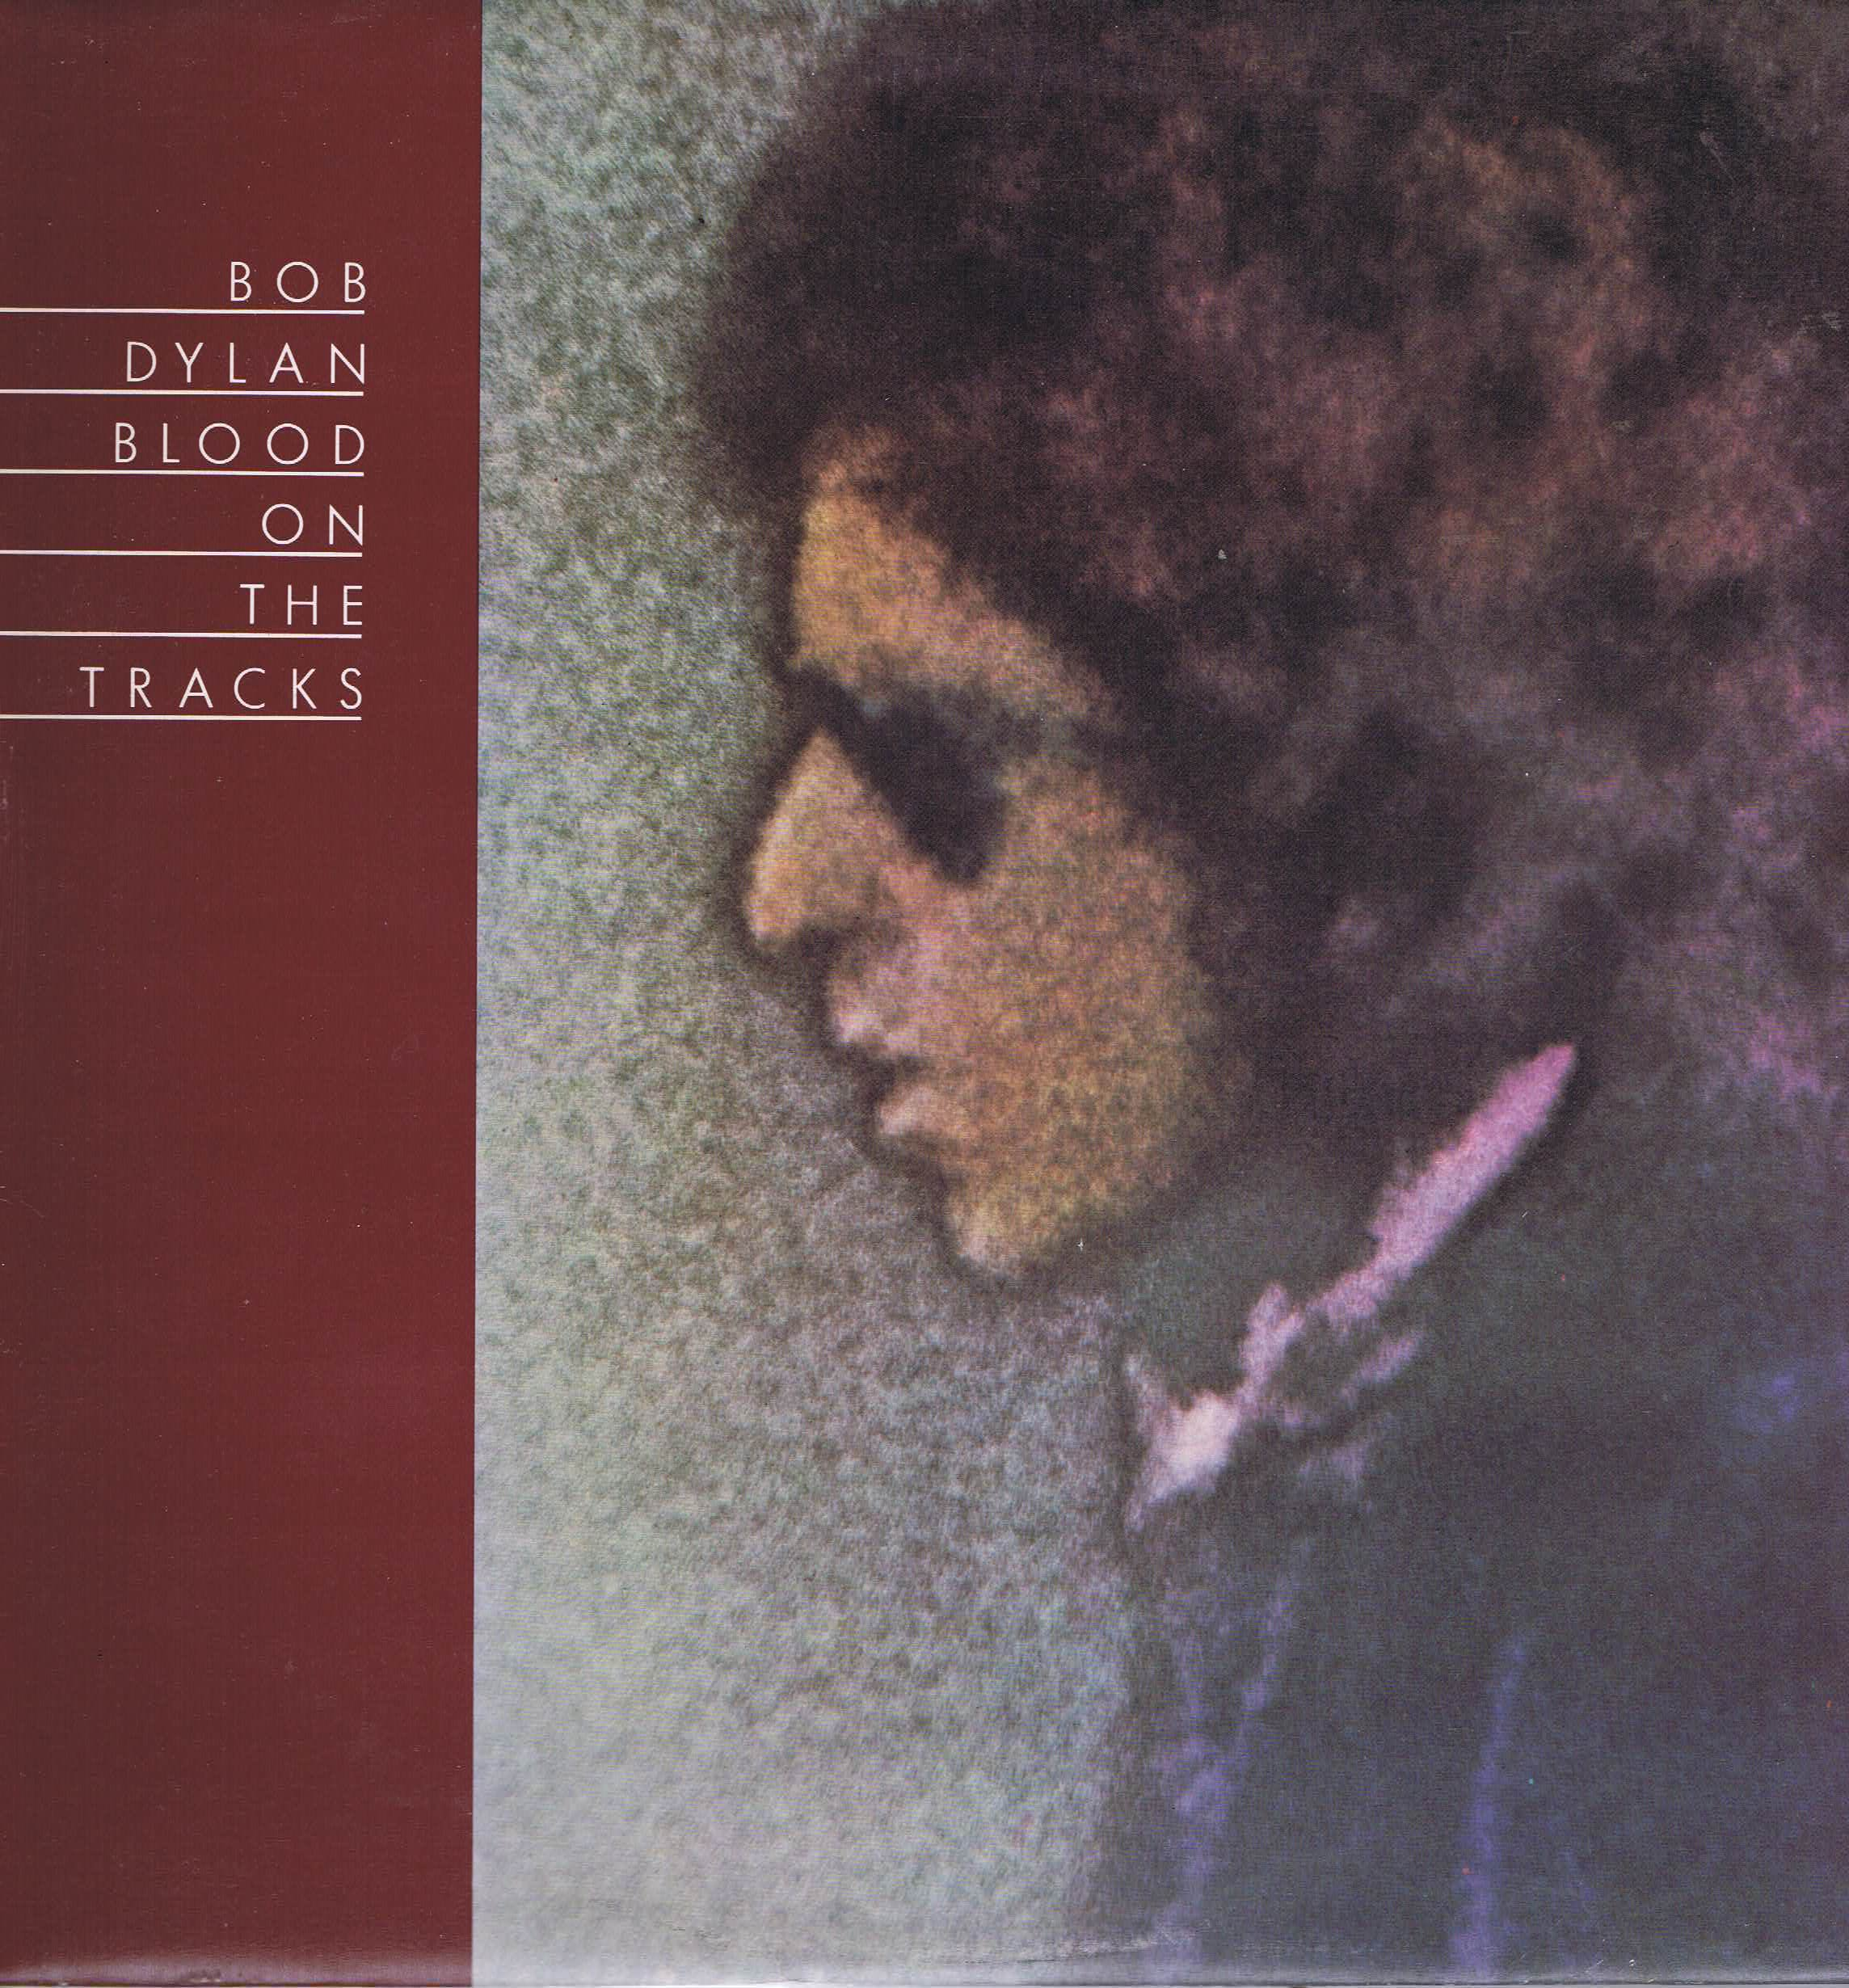 Bob Dylan Blood On The Tracks Cbs S 69097 Lp Vinyl